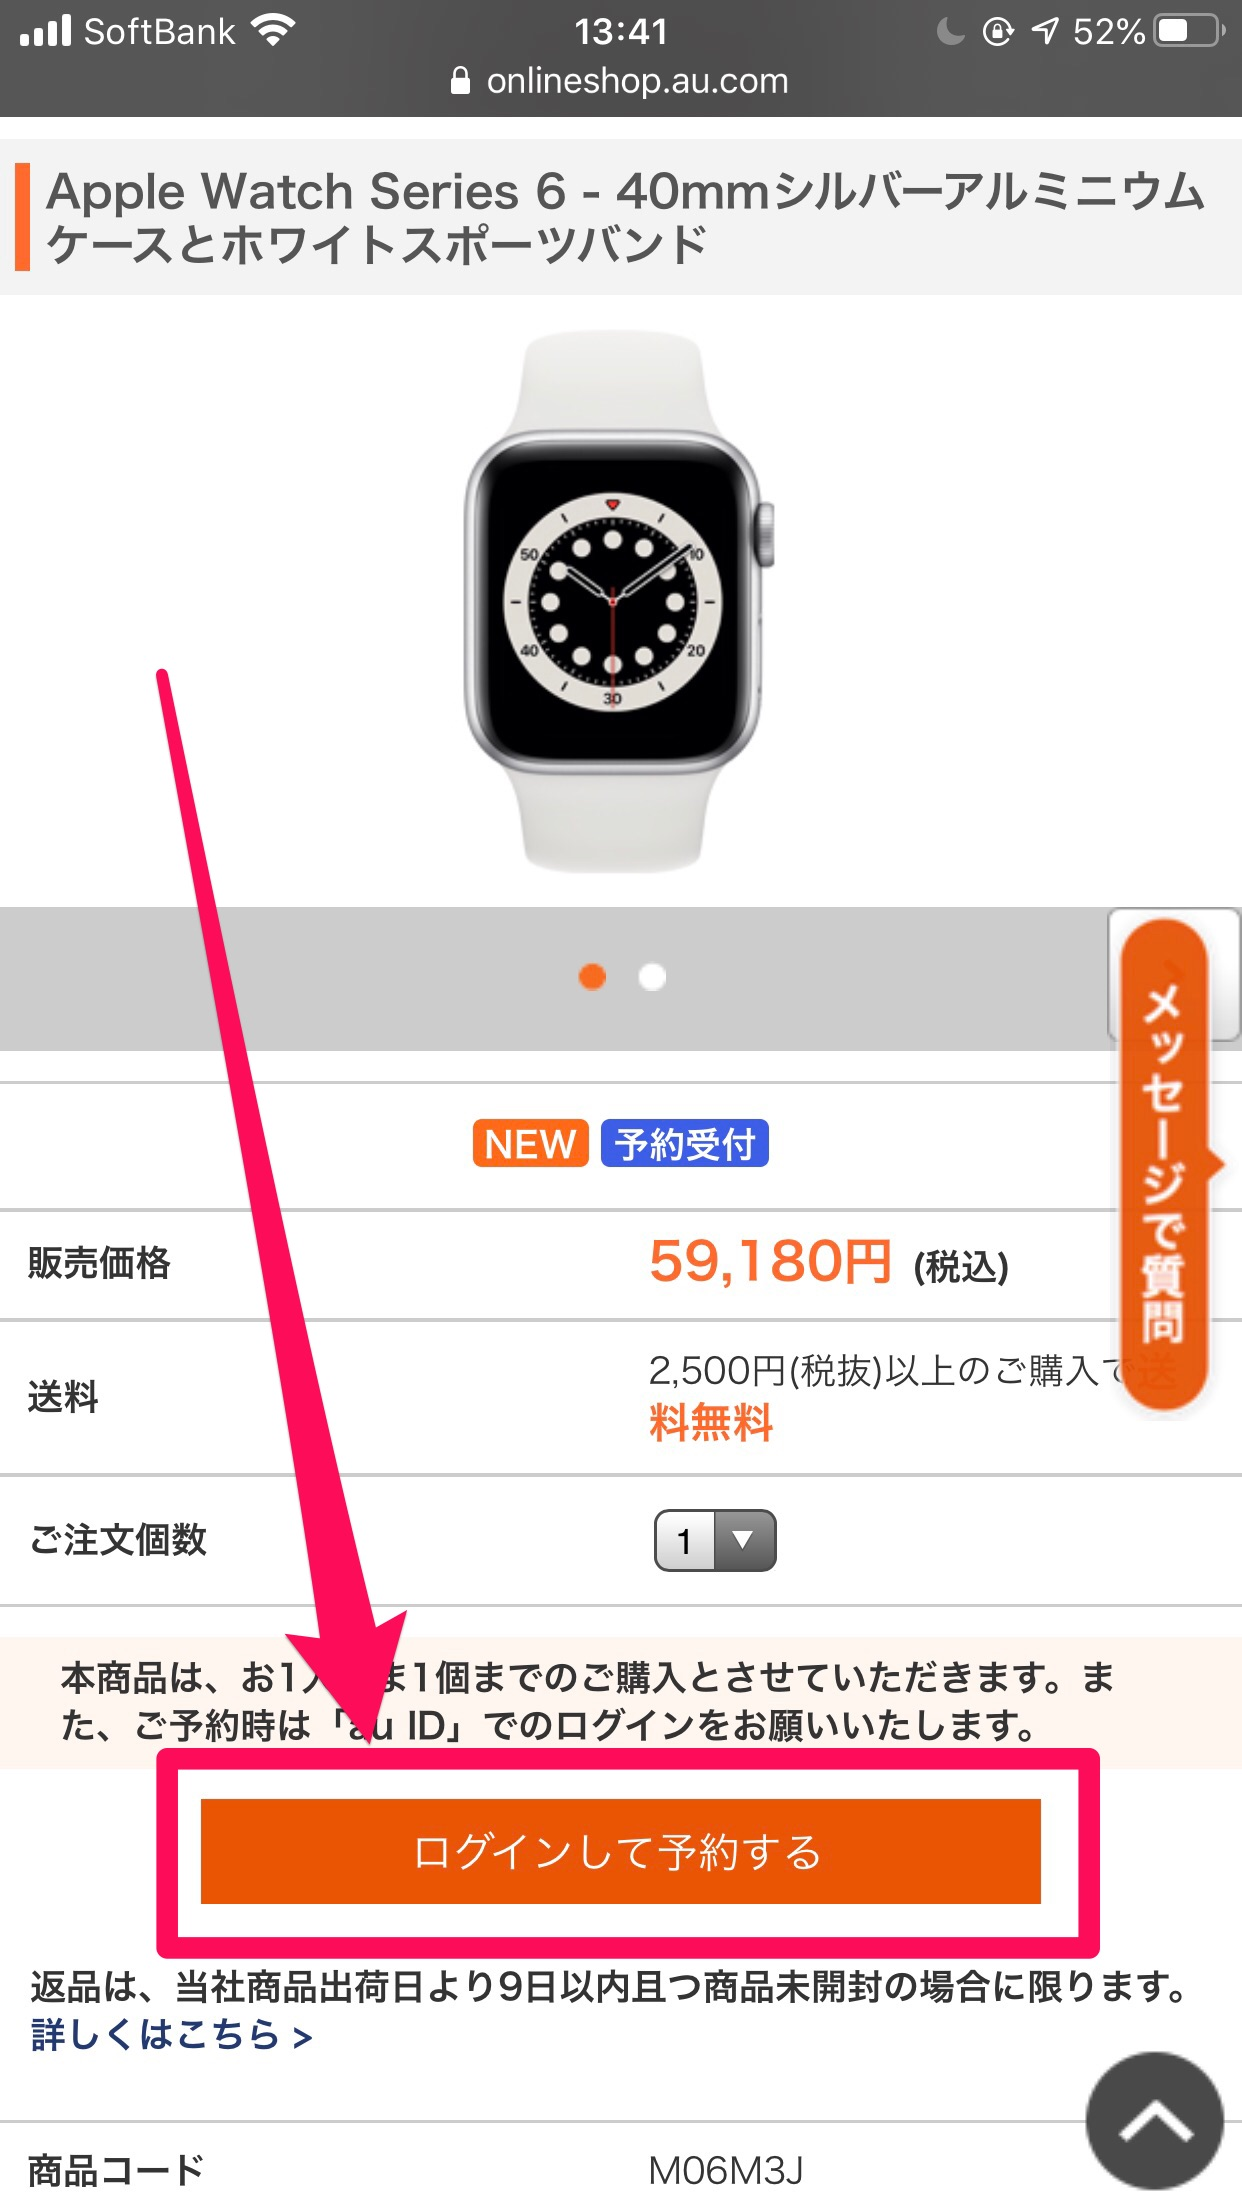 auオンラインショップでApple Watch購入手順4